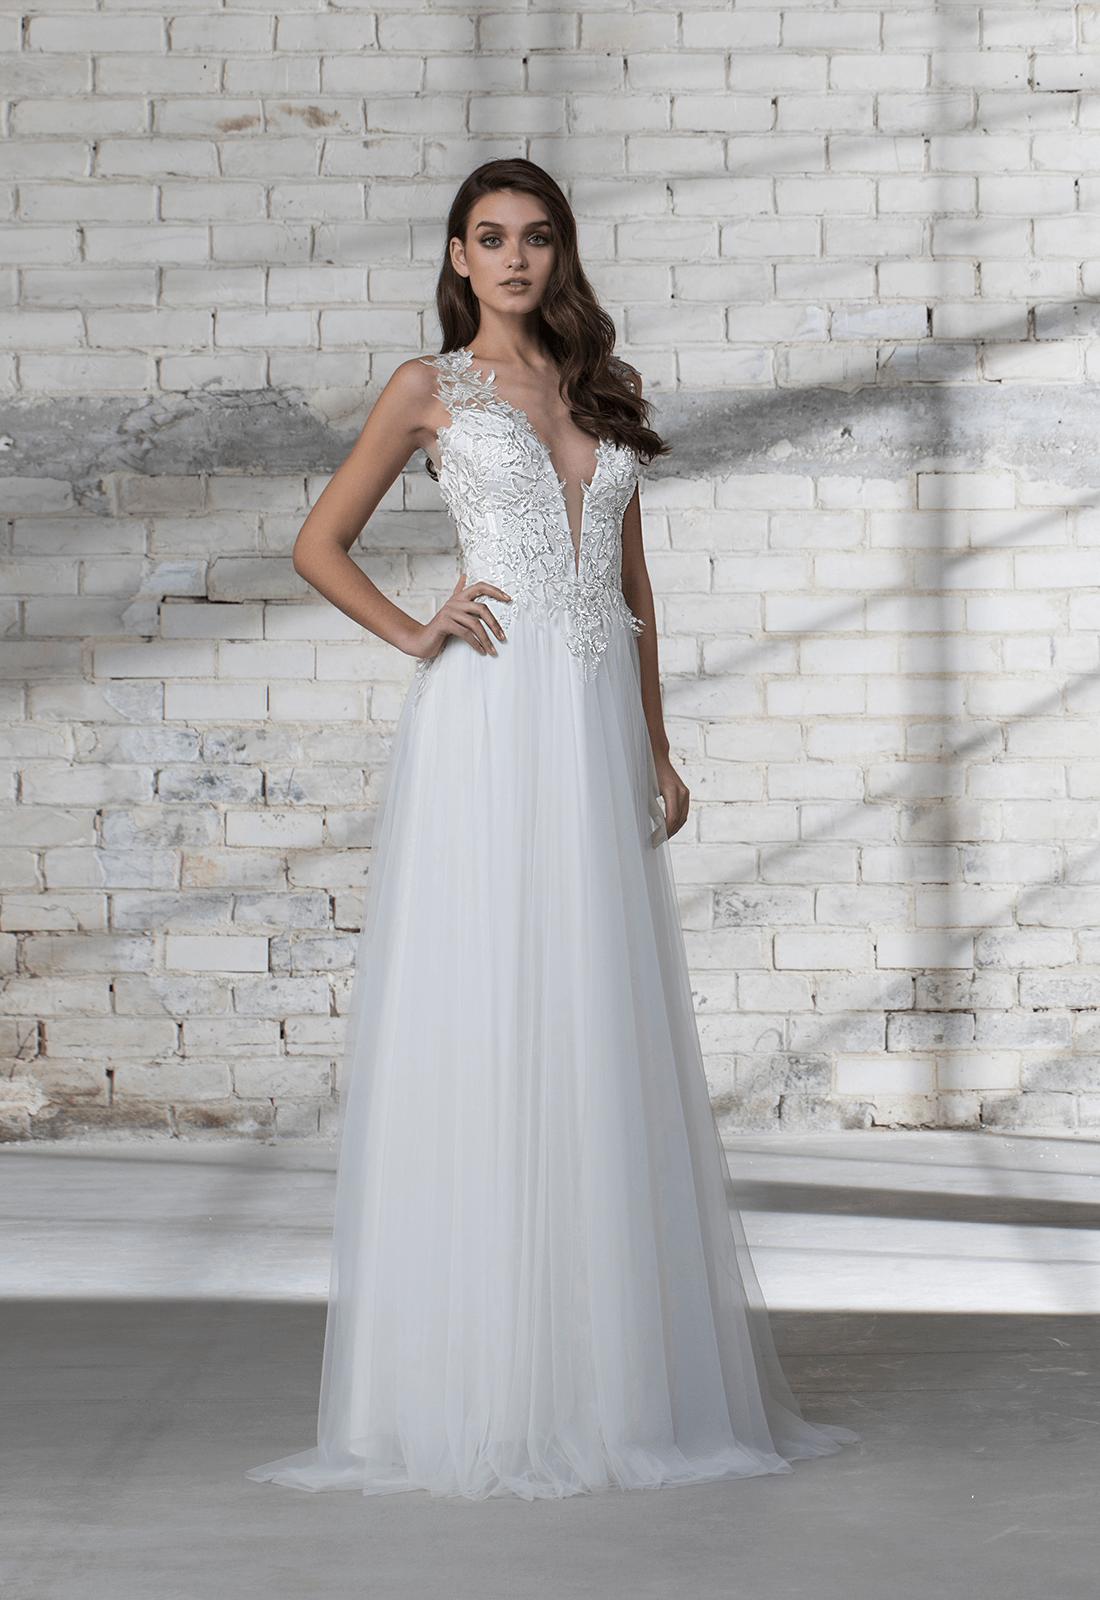 Sleeveless A-line Tulle Skirt With Corset Bodice Wedding Dress ...